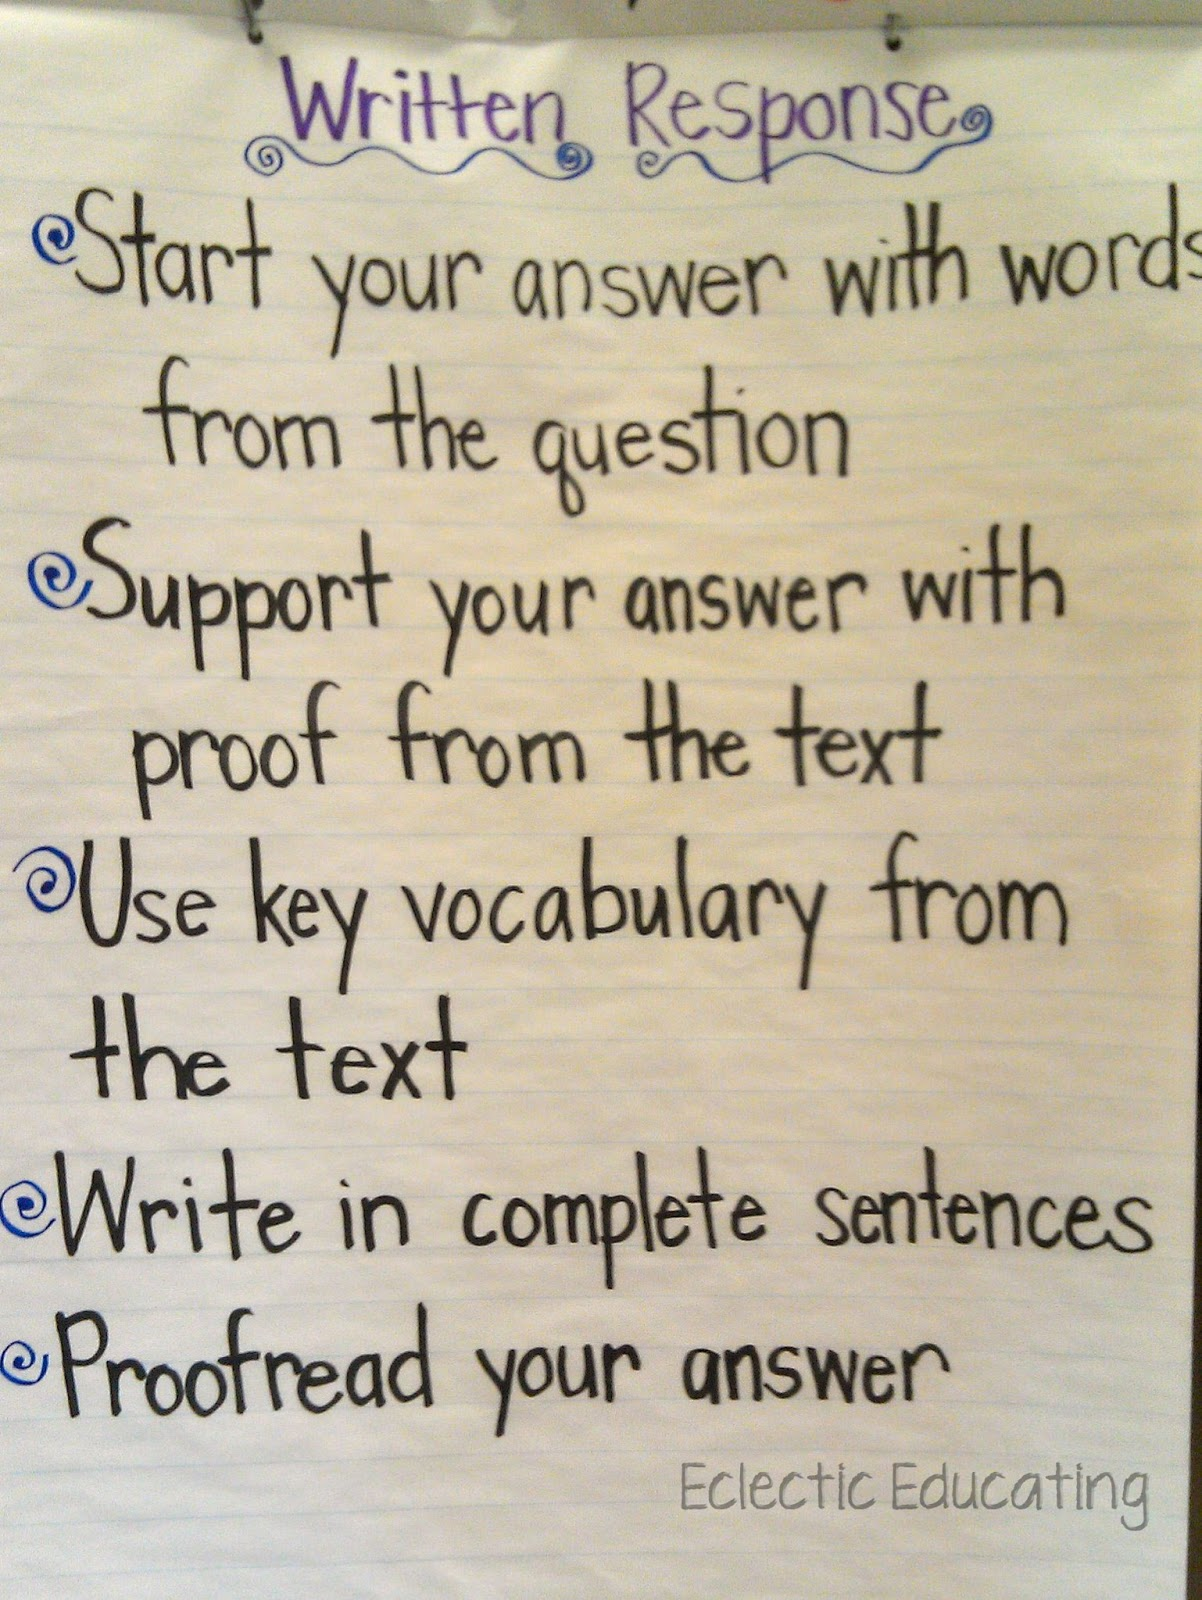 how to write a written response